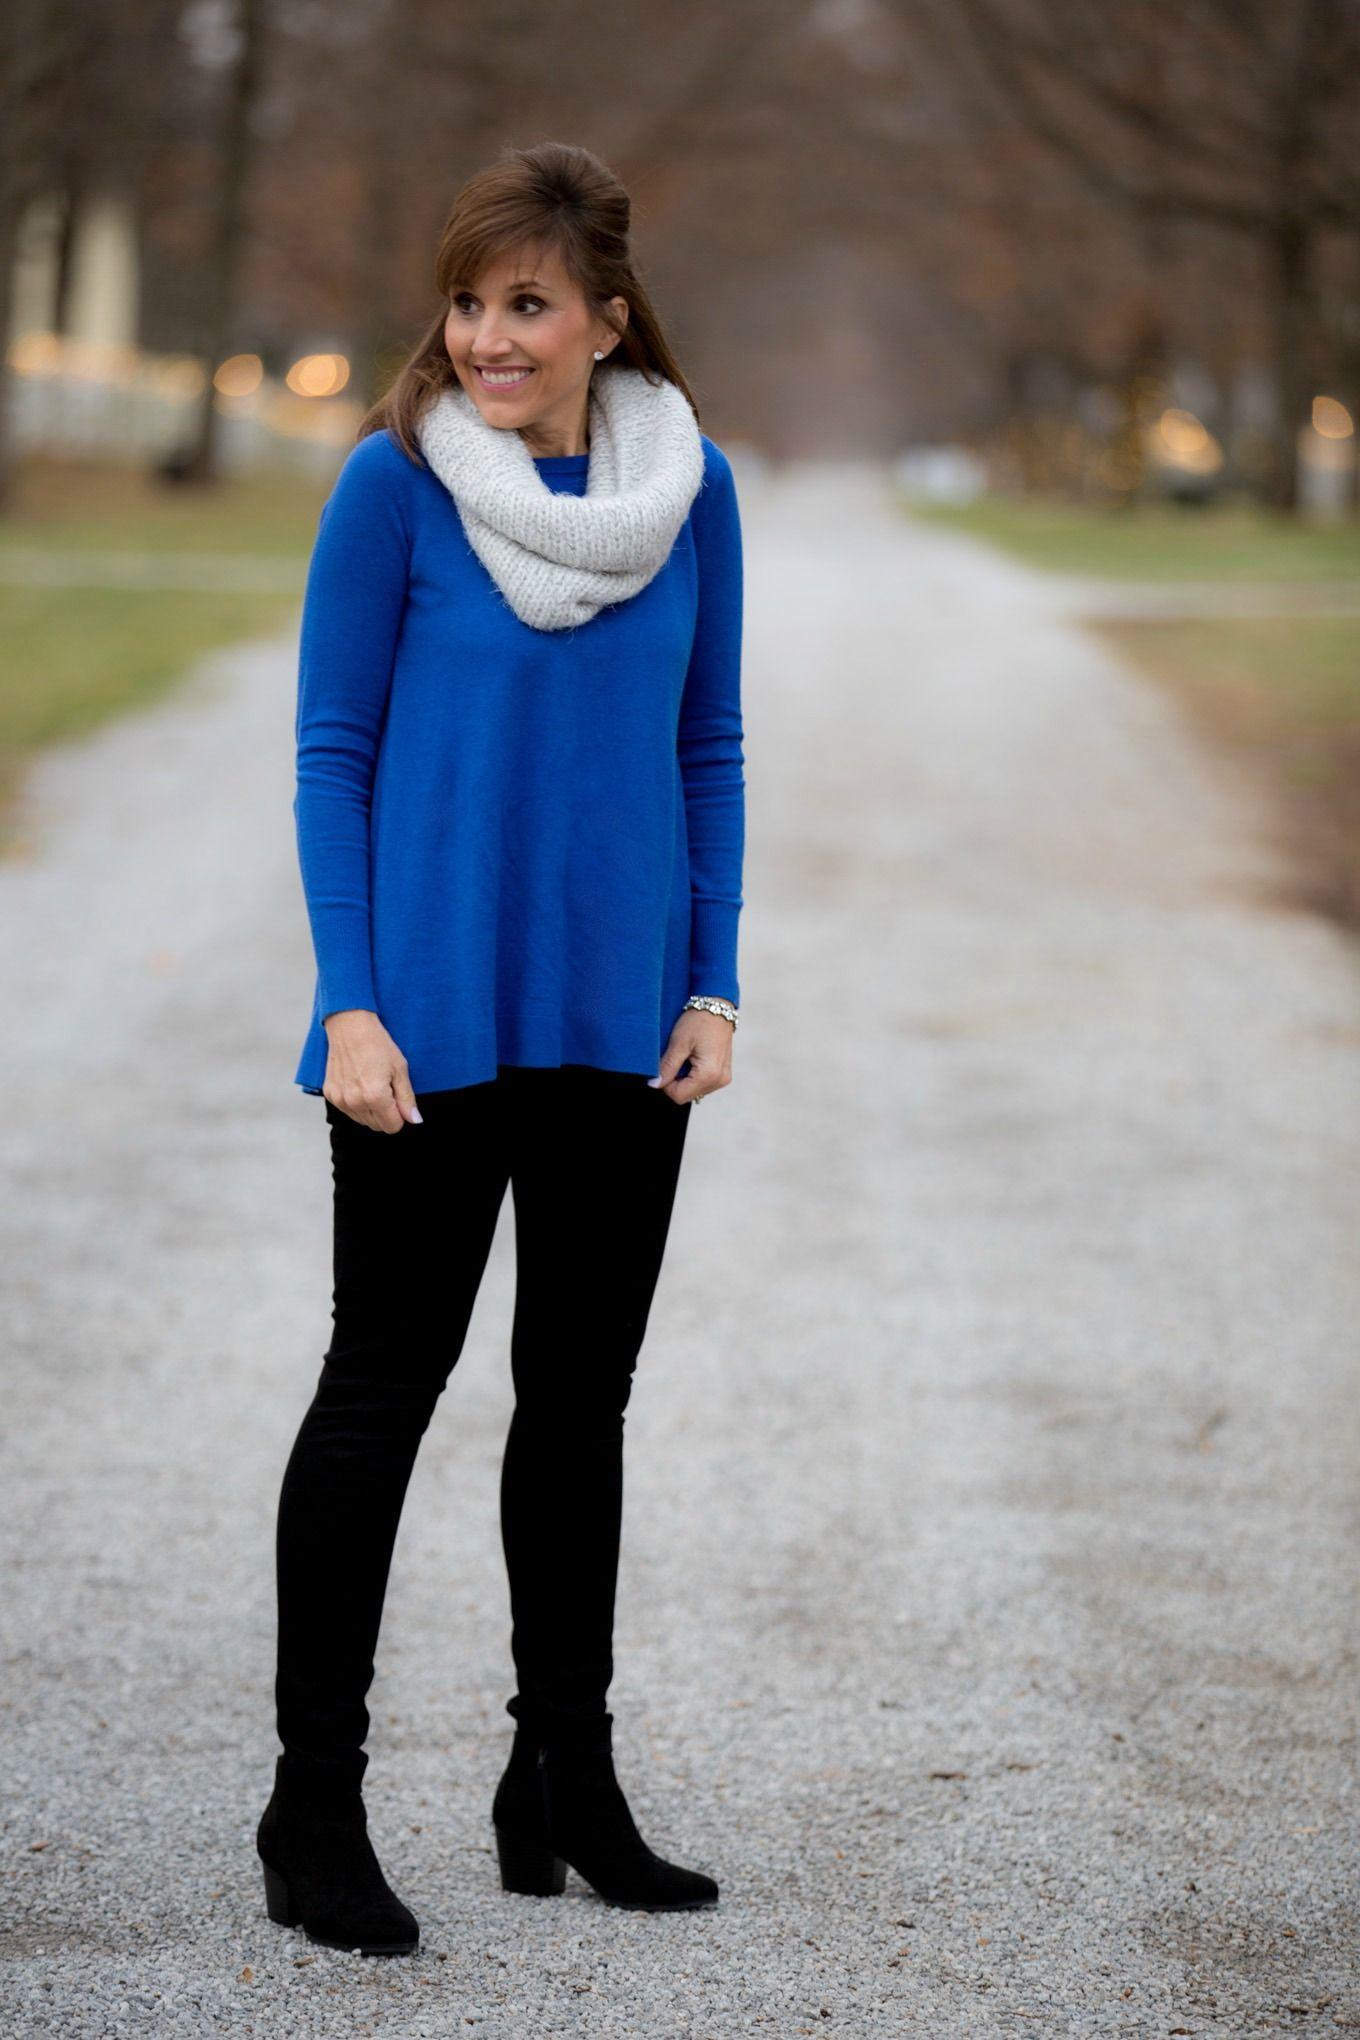 Royal Blue Sweater from Loft-Winter Fashion | Royal blue sweater ...